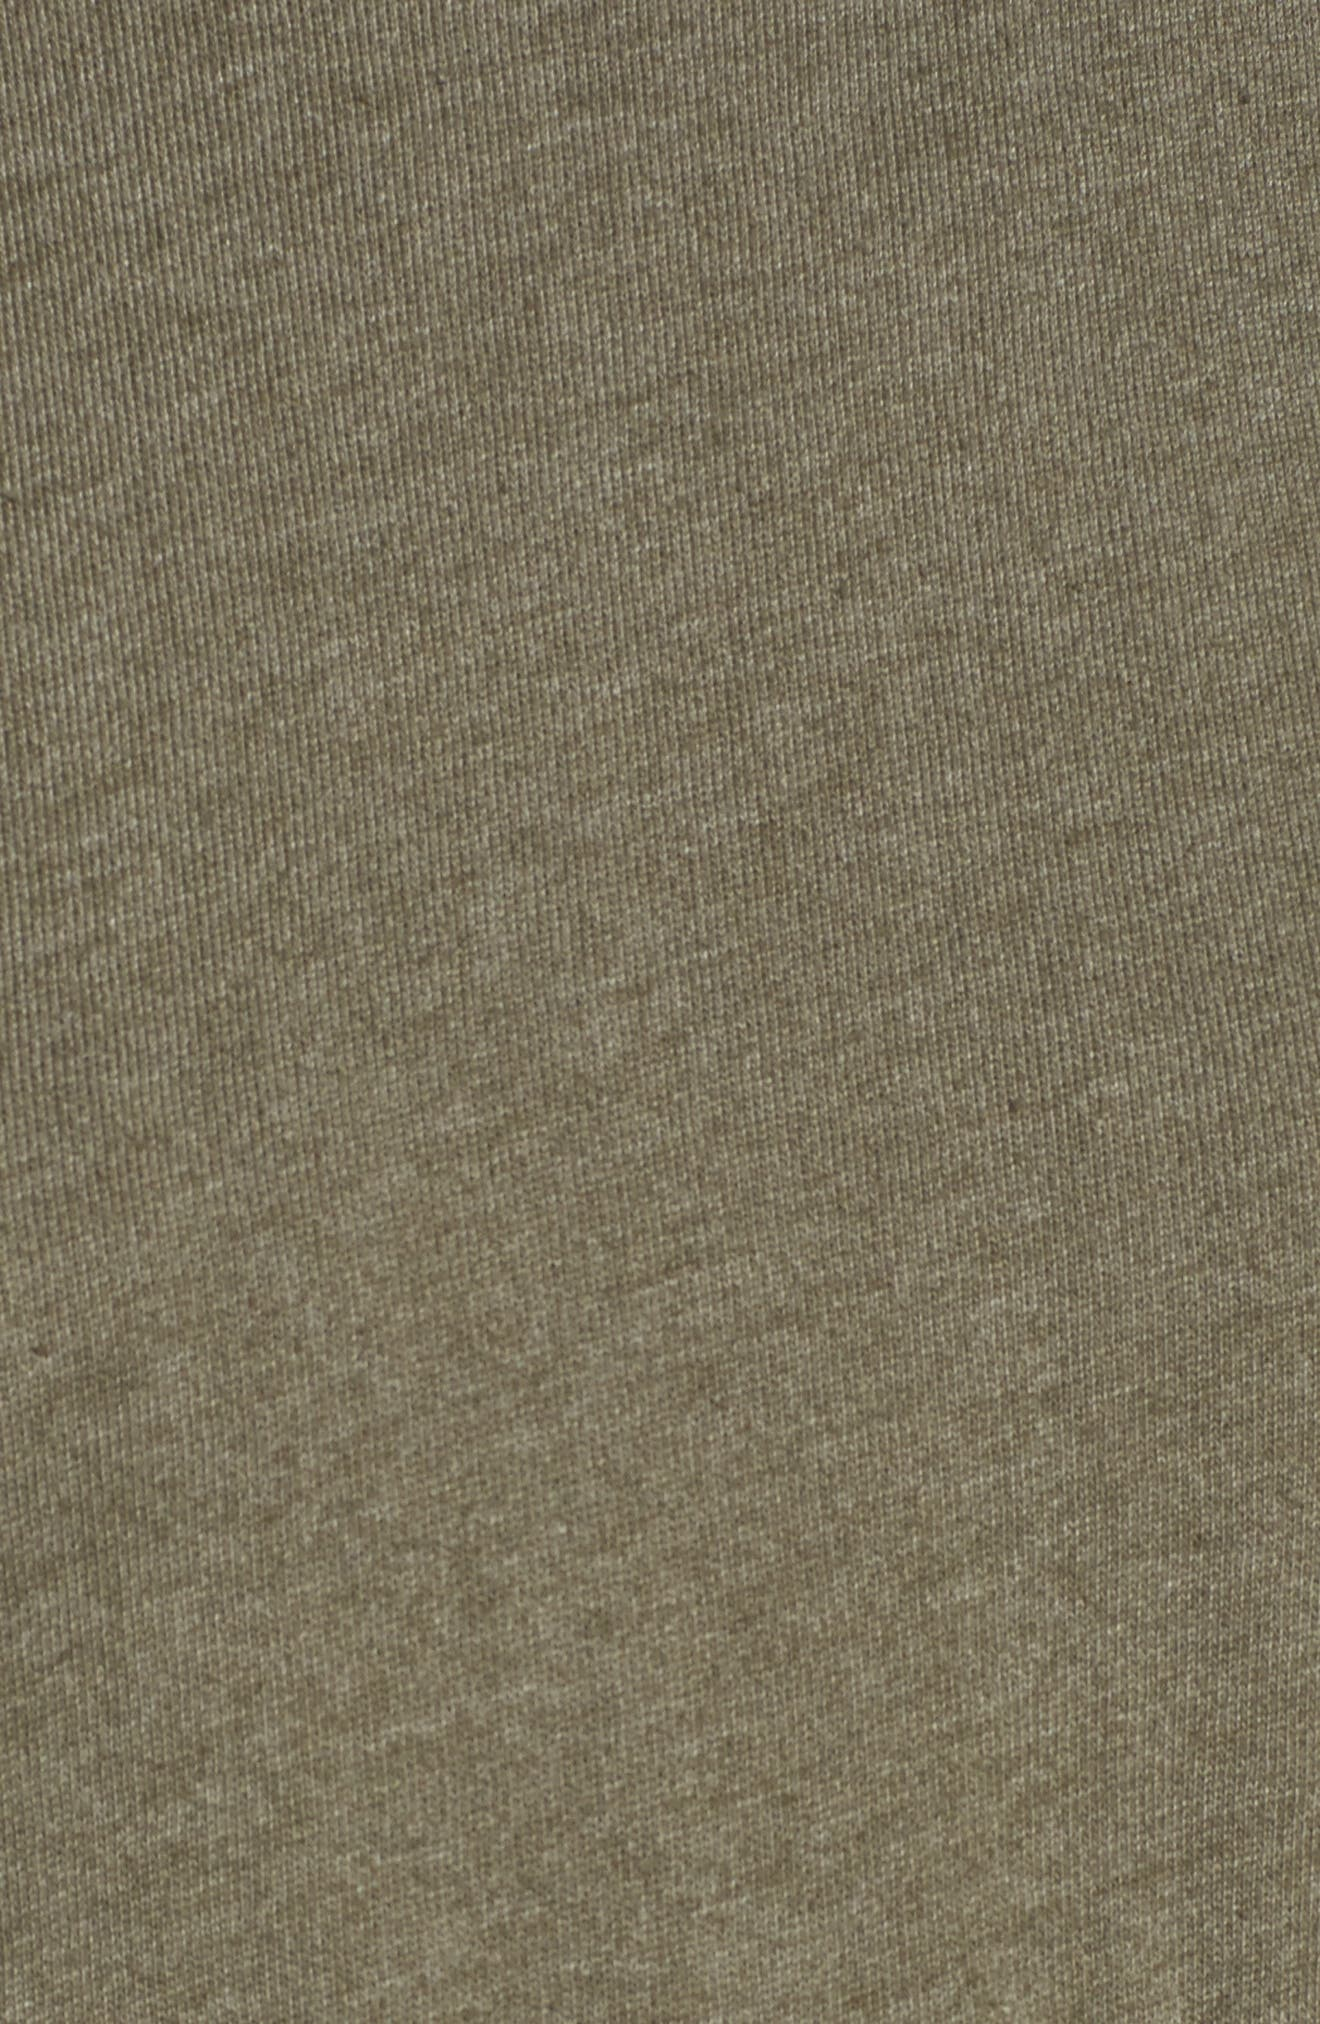 Viera Fleece Peplum Sweatshirt,                             Alternate thumbnail 10, color,